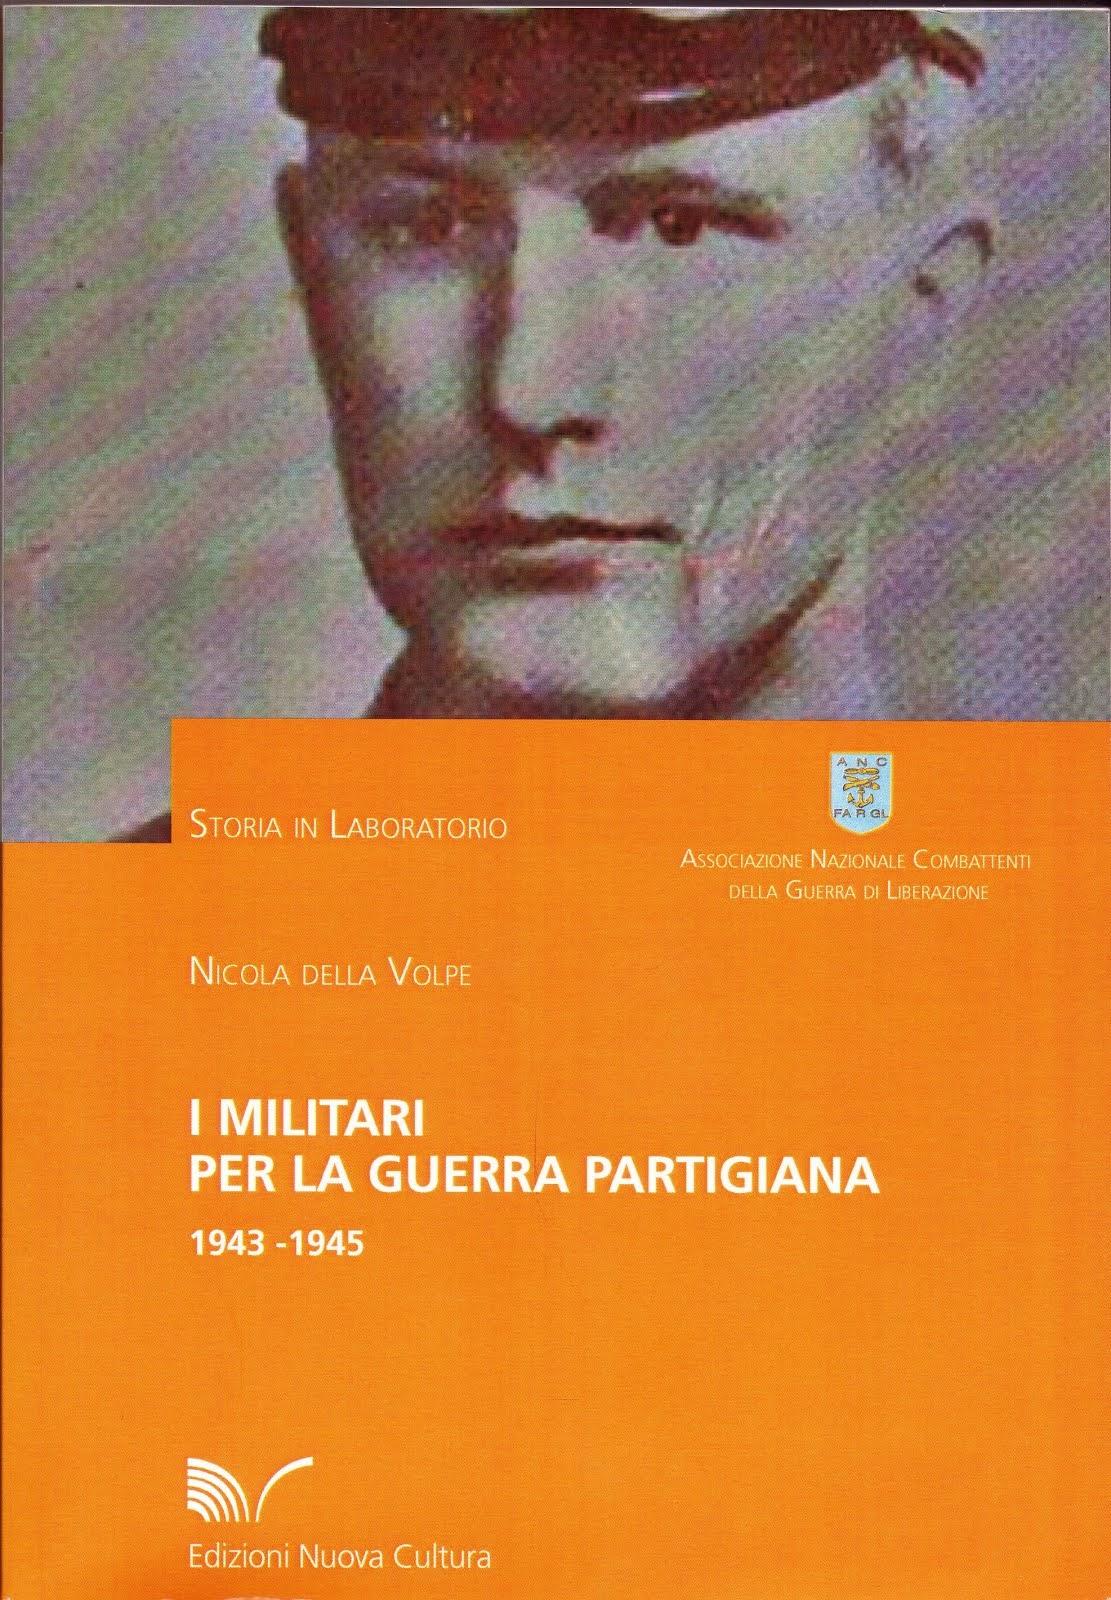 I Militari nella Guerra partigiana 1943-1945